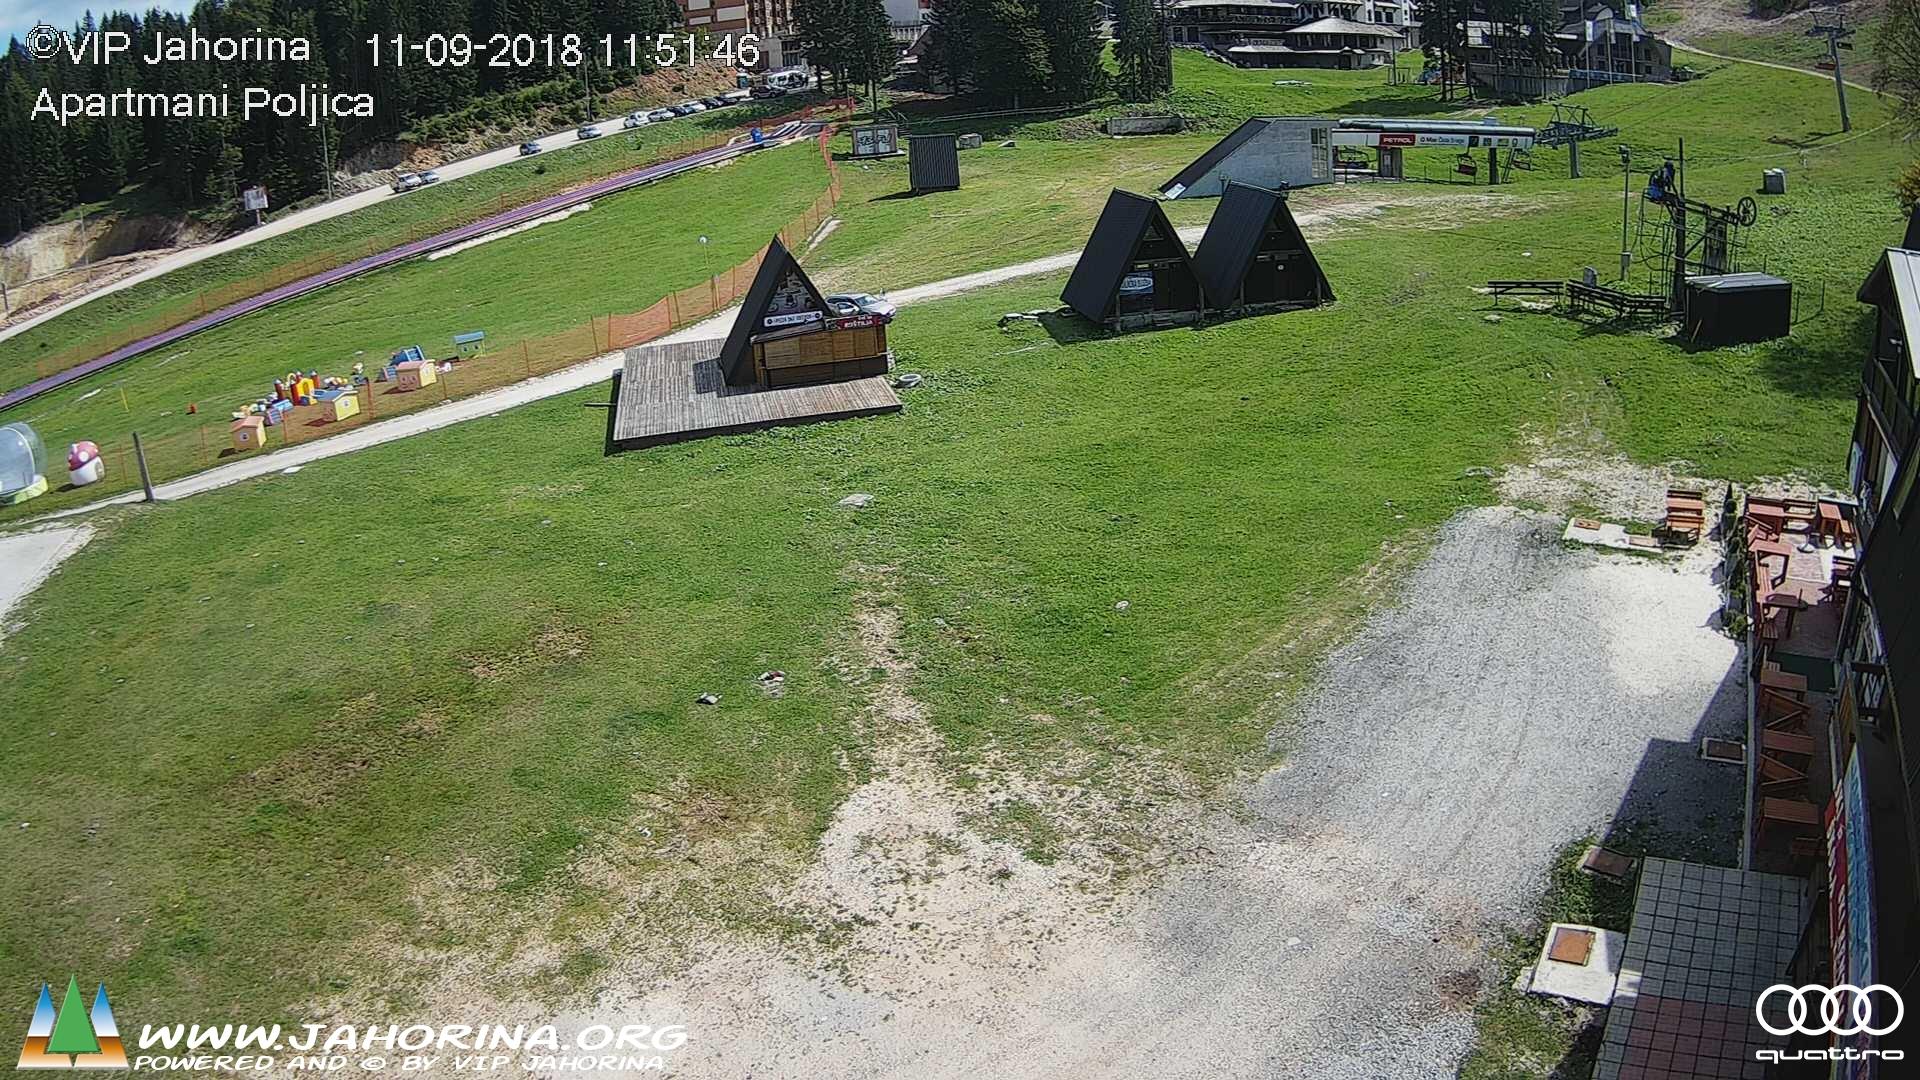 Webcam Jahorina Poljica